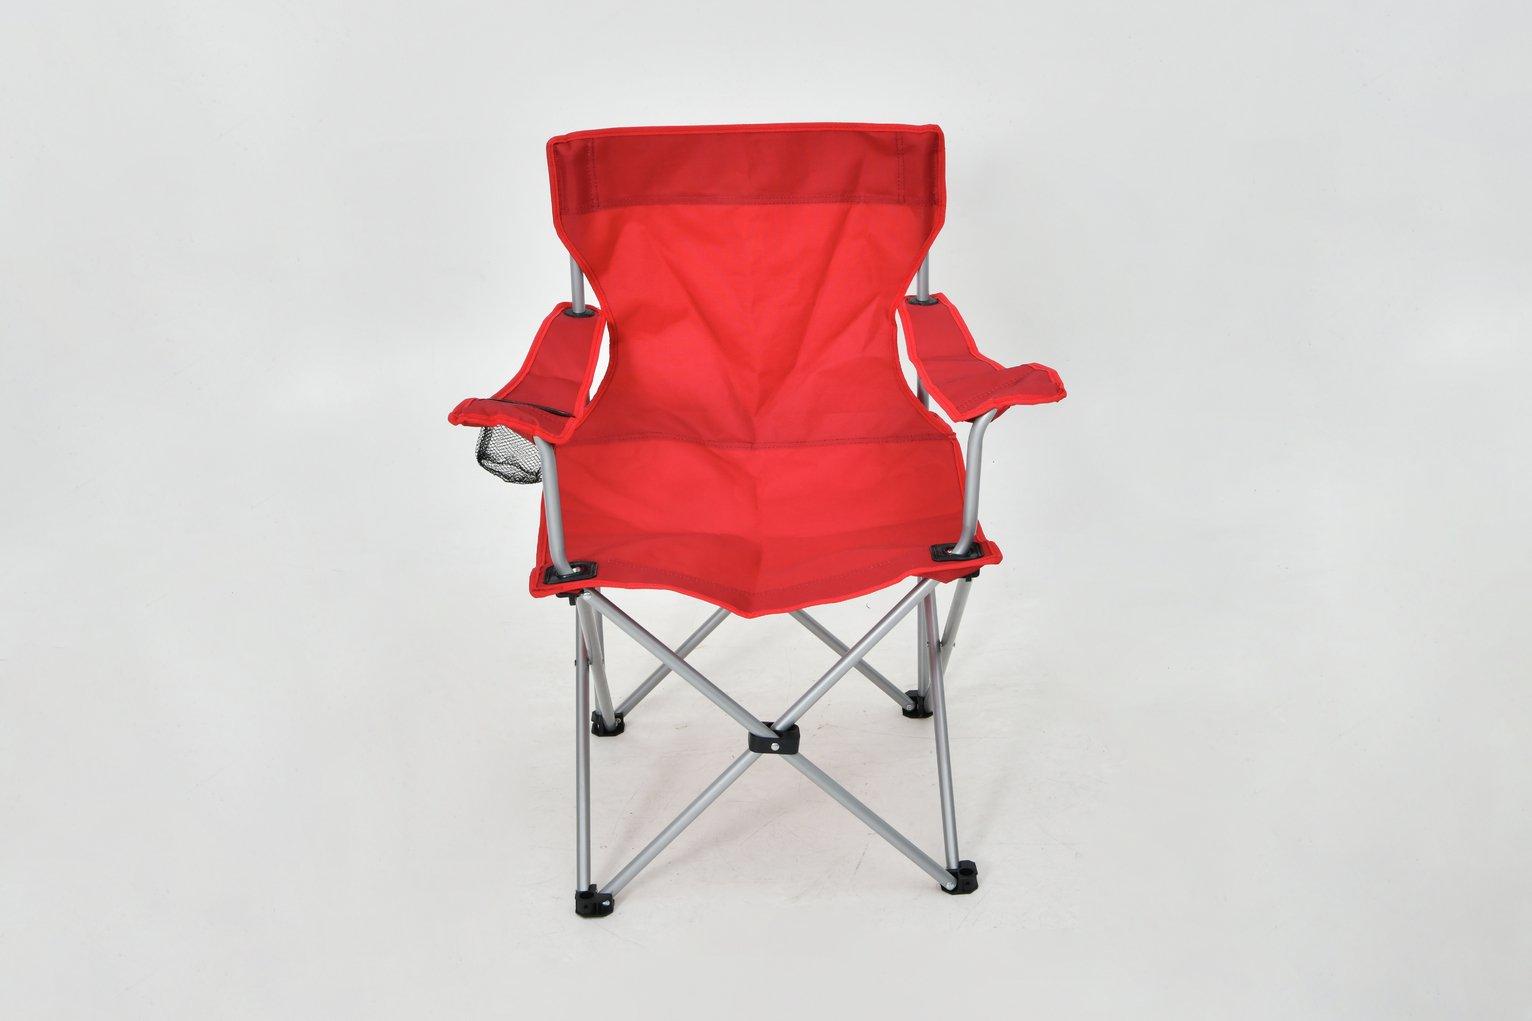 folding picnic chairs b q wooden reclining garden uk camping argos